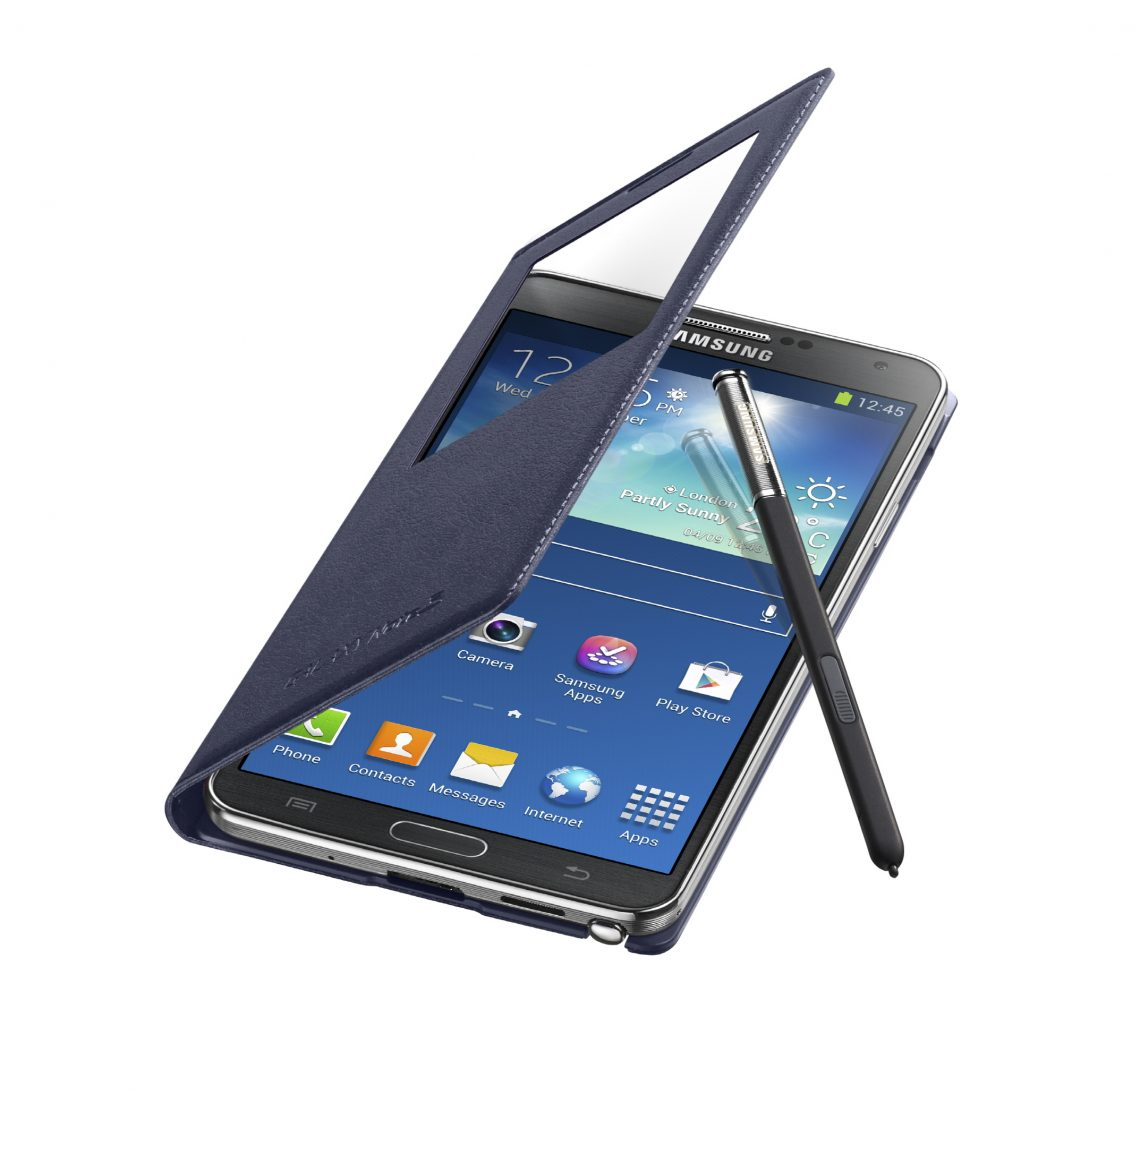 Samsung กำลังพัฒนา S View cover ที่สามารถทำให้สมาร์ทโฟนรุ่นอื่นใช้ปากกา S Pen ได้ !!!